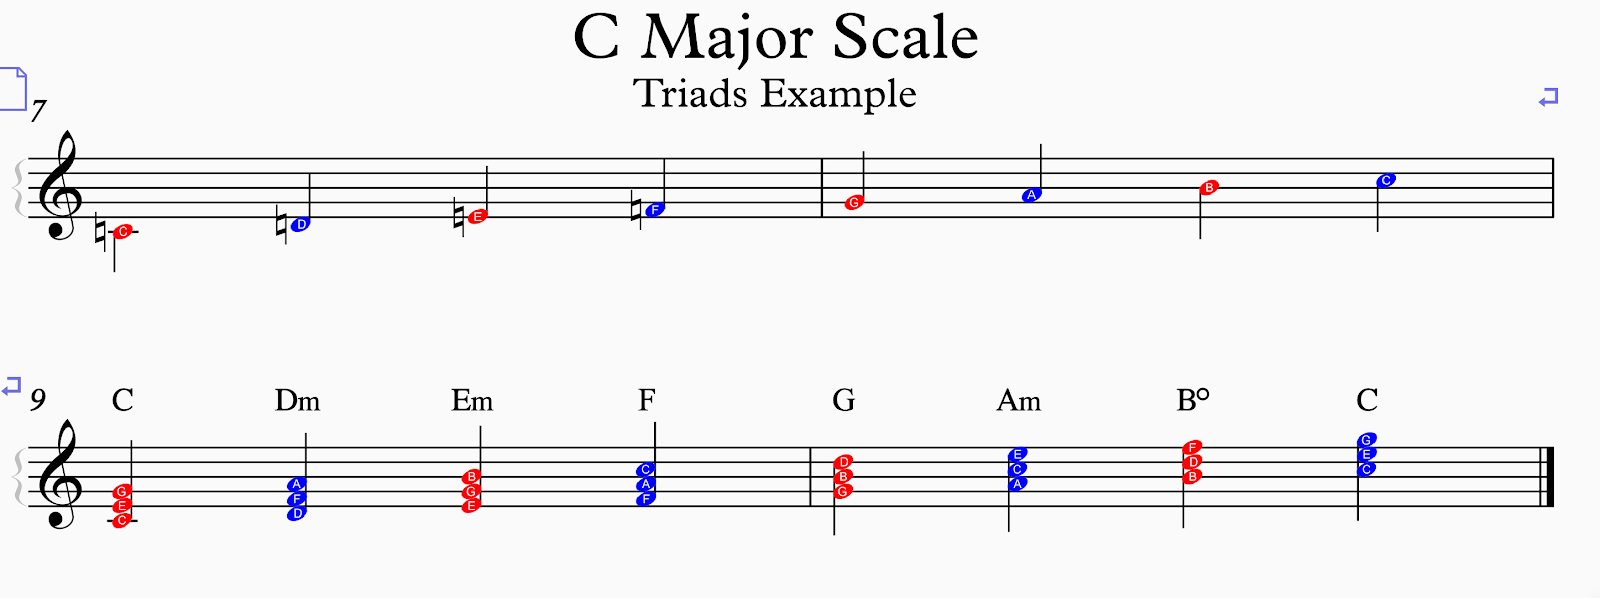 C Major Scale Polychord